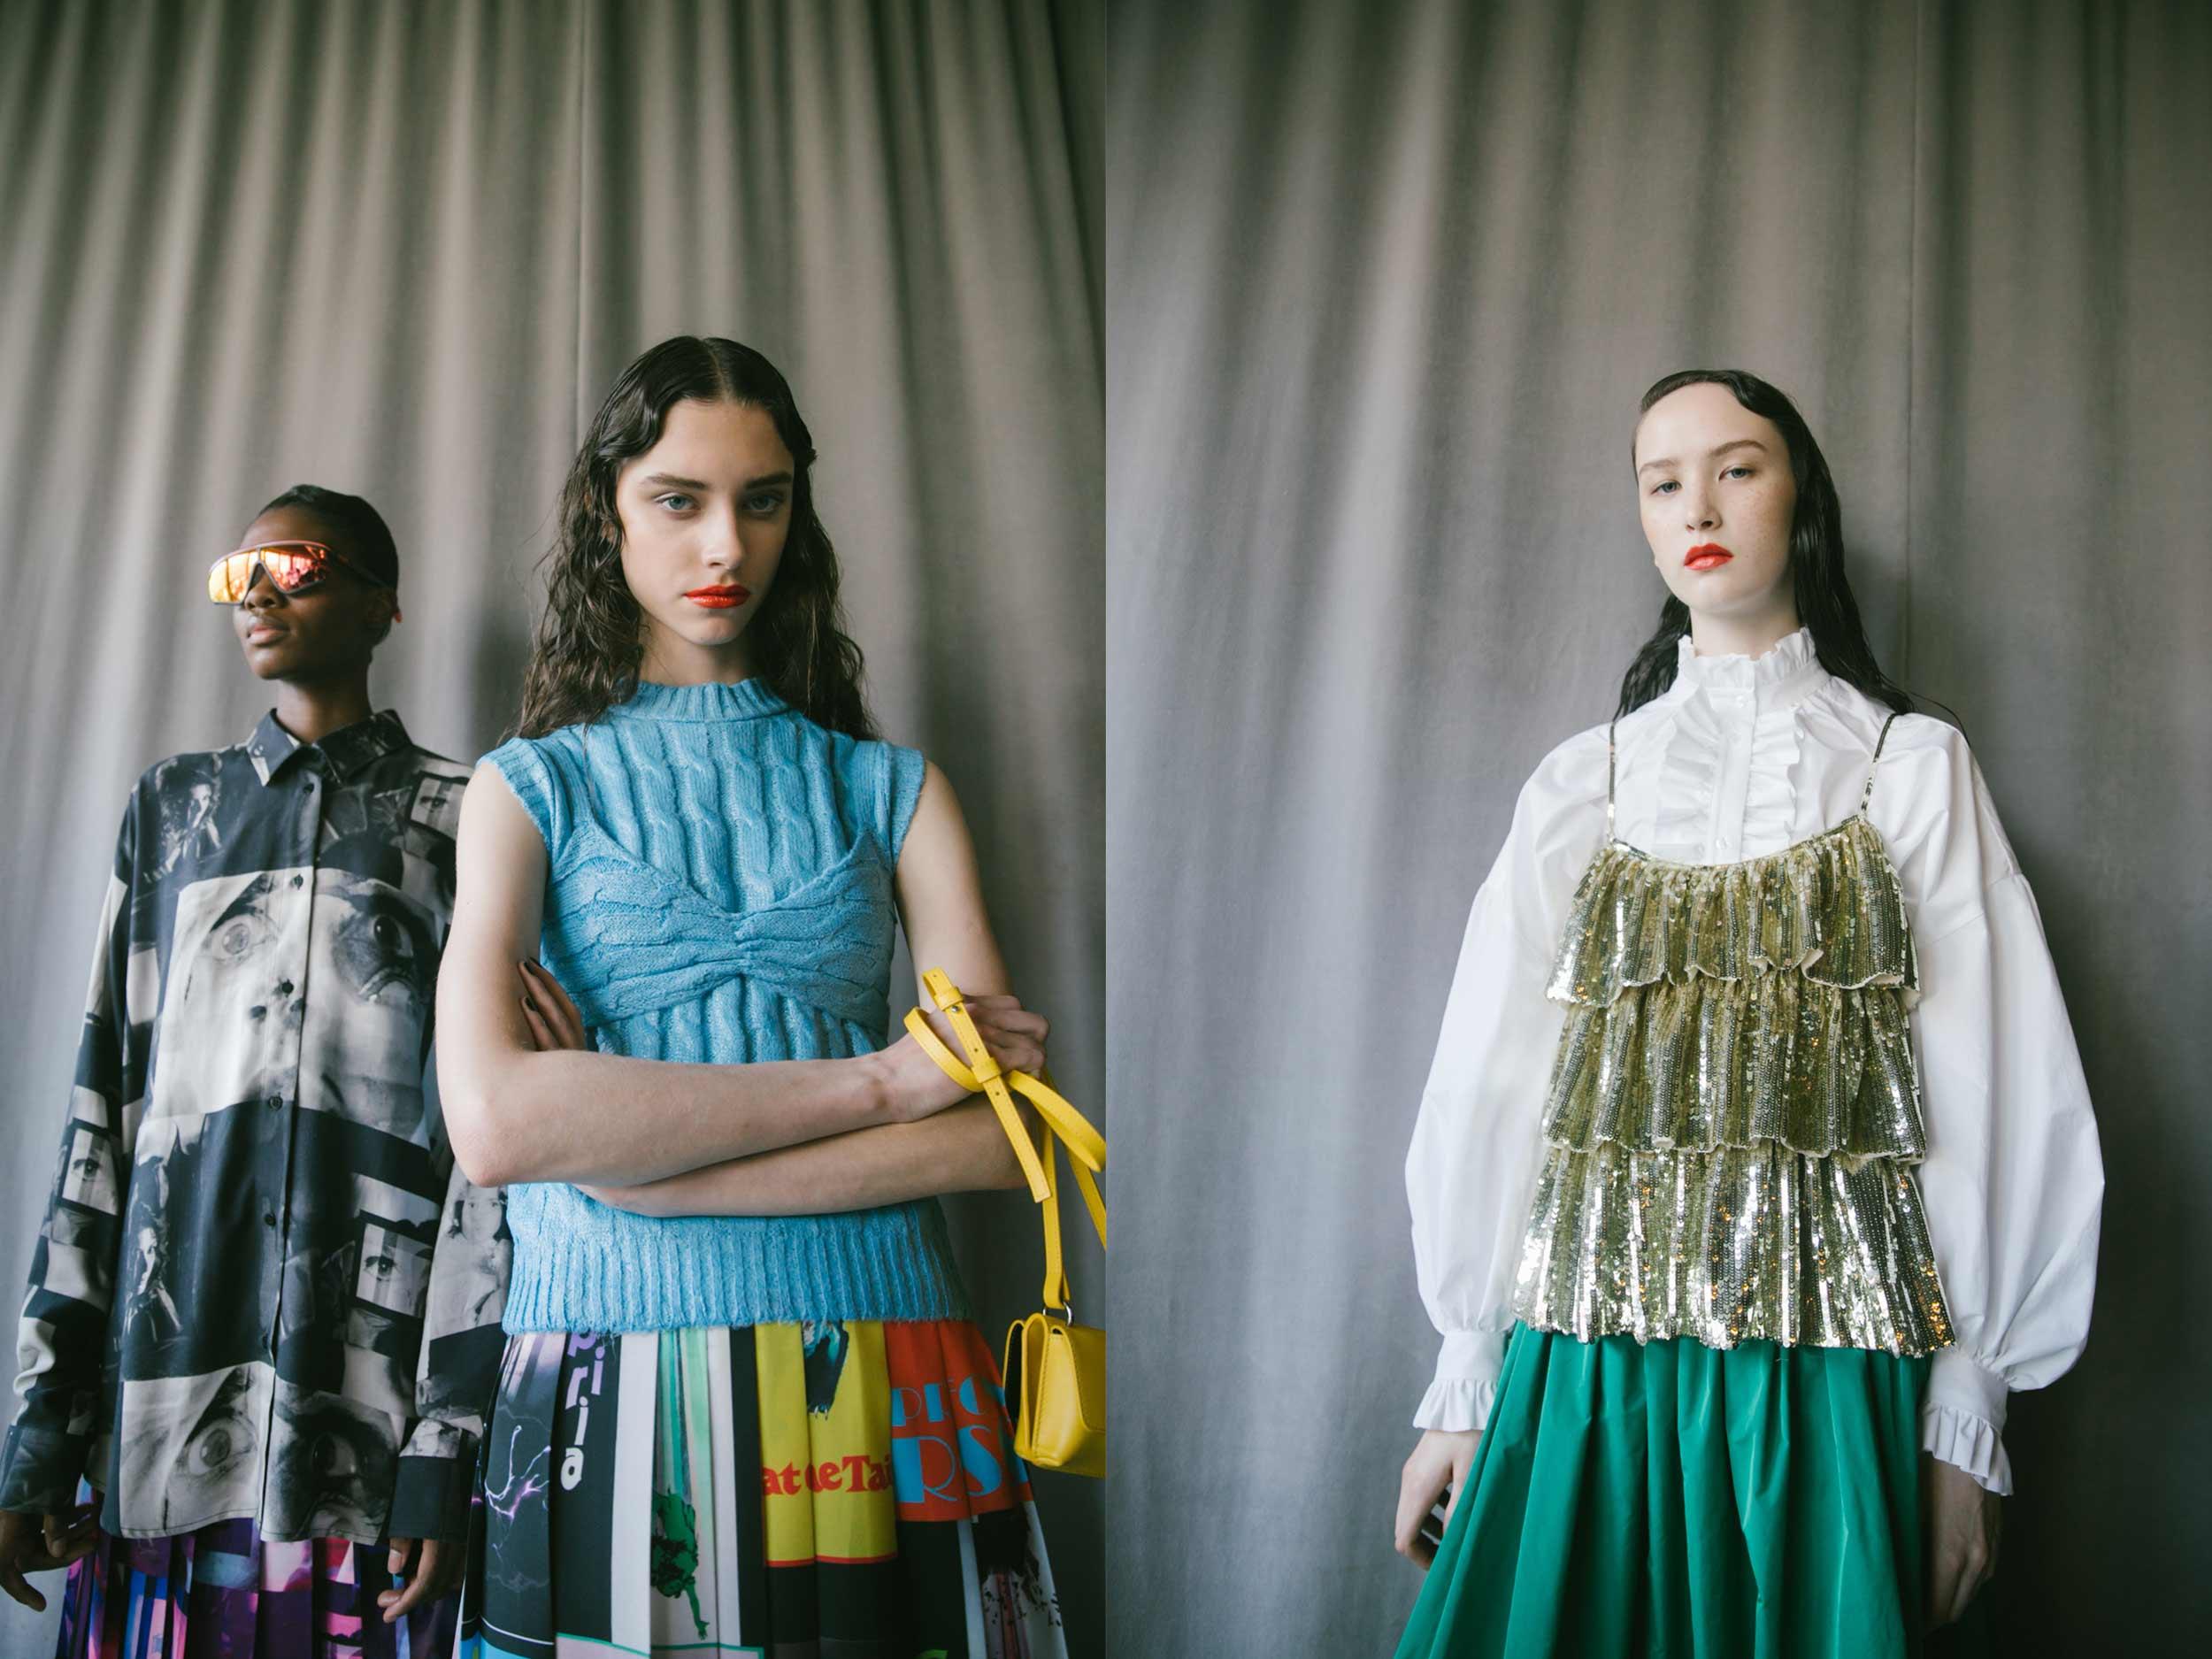 'Suspiria' chic lives on: MSGM's witchy schoolgirls take Milan